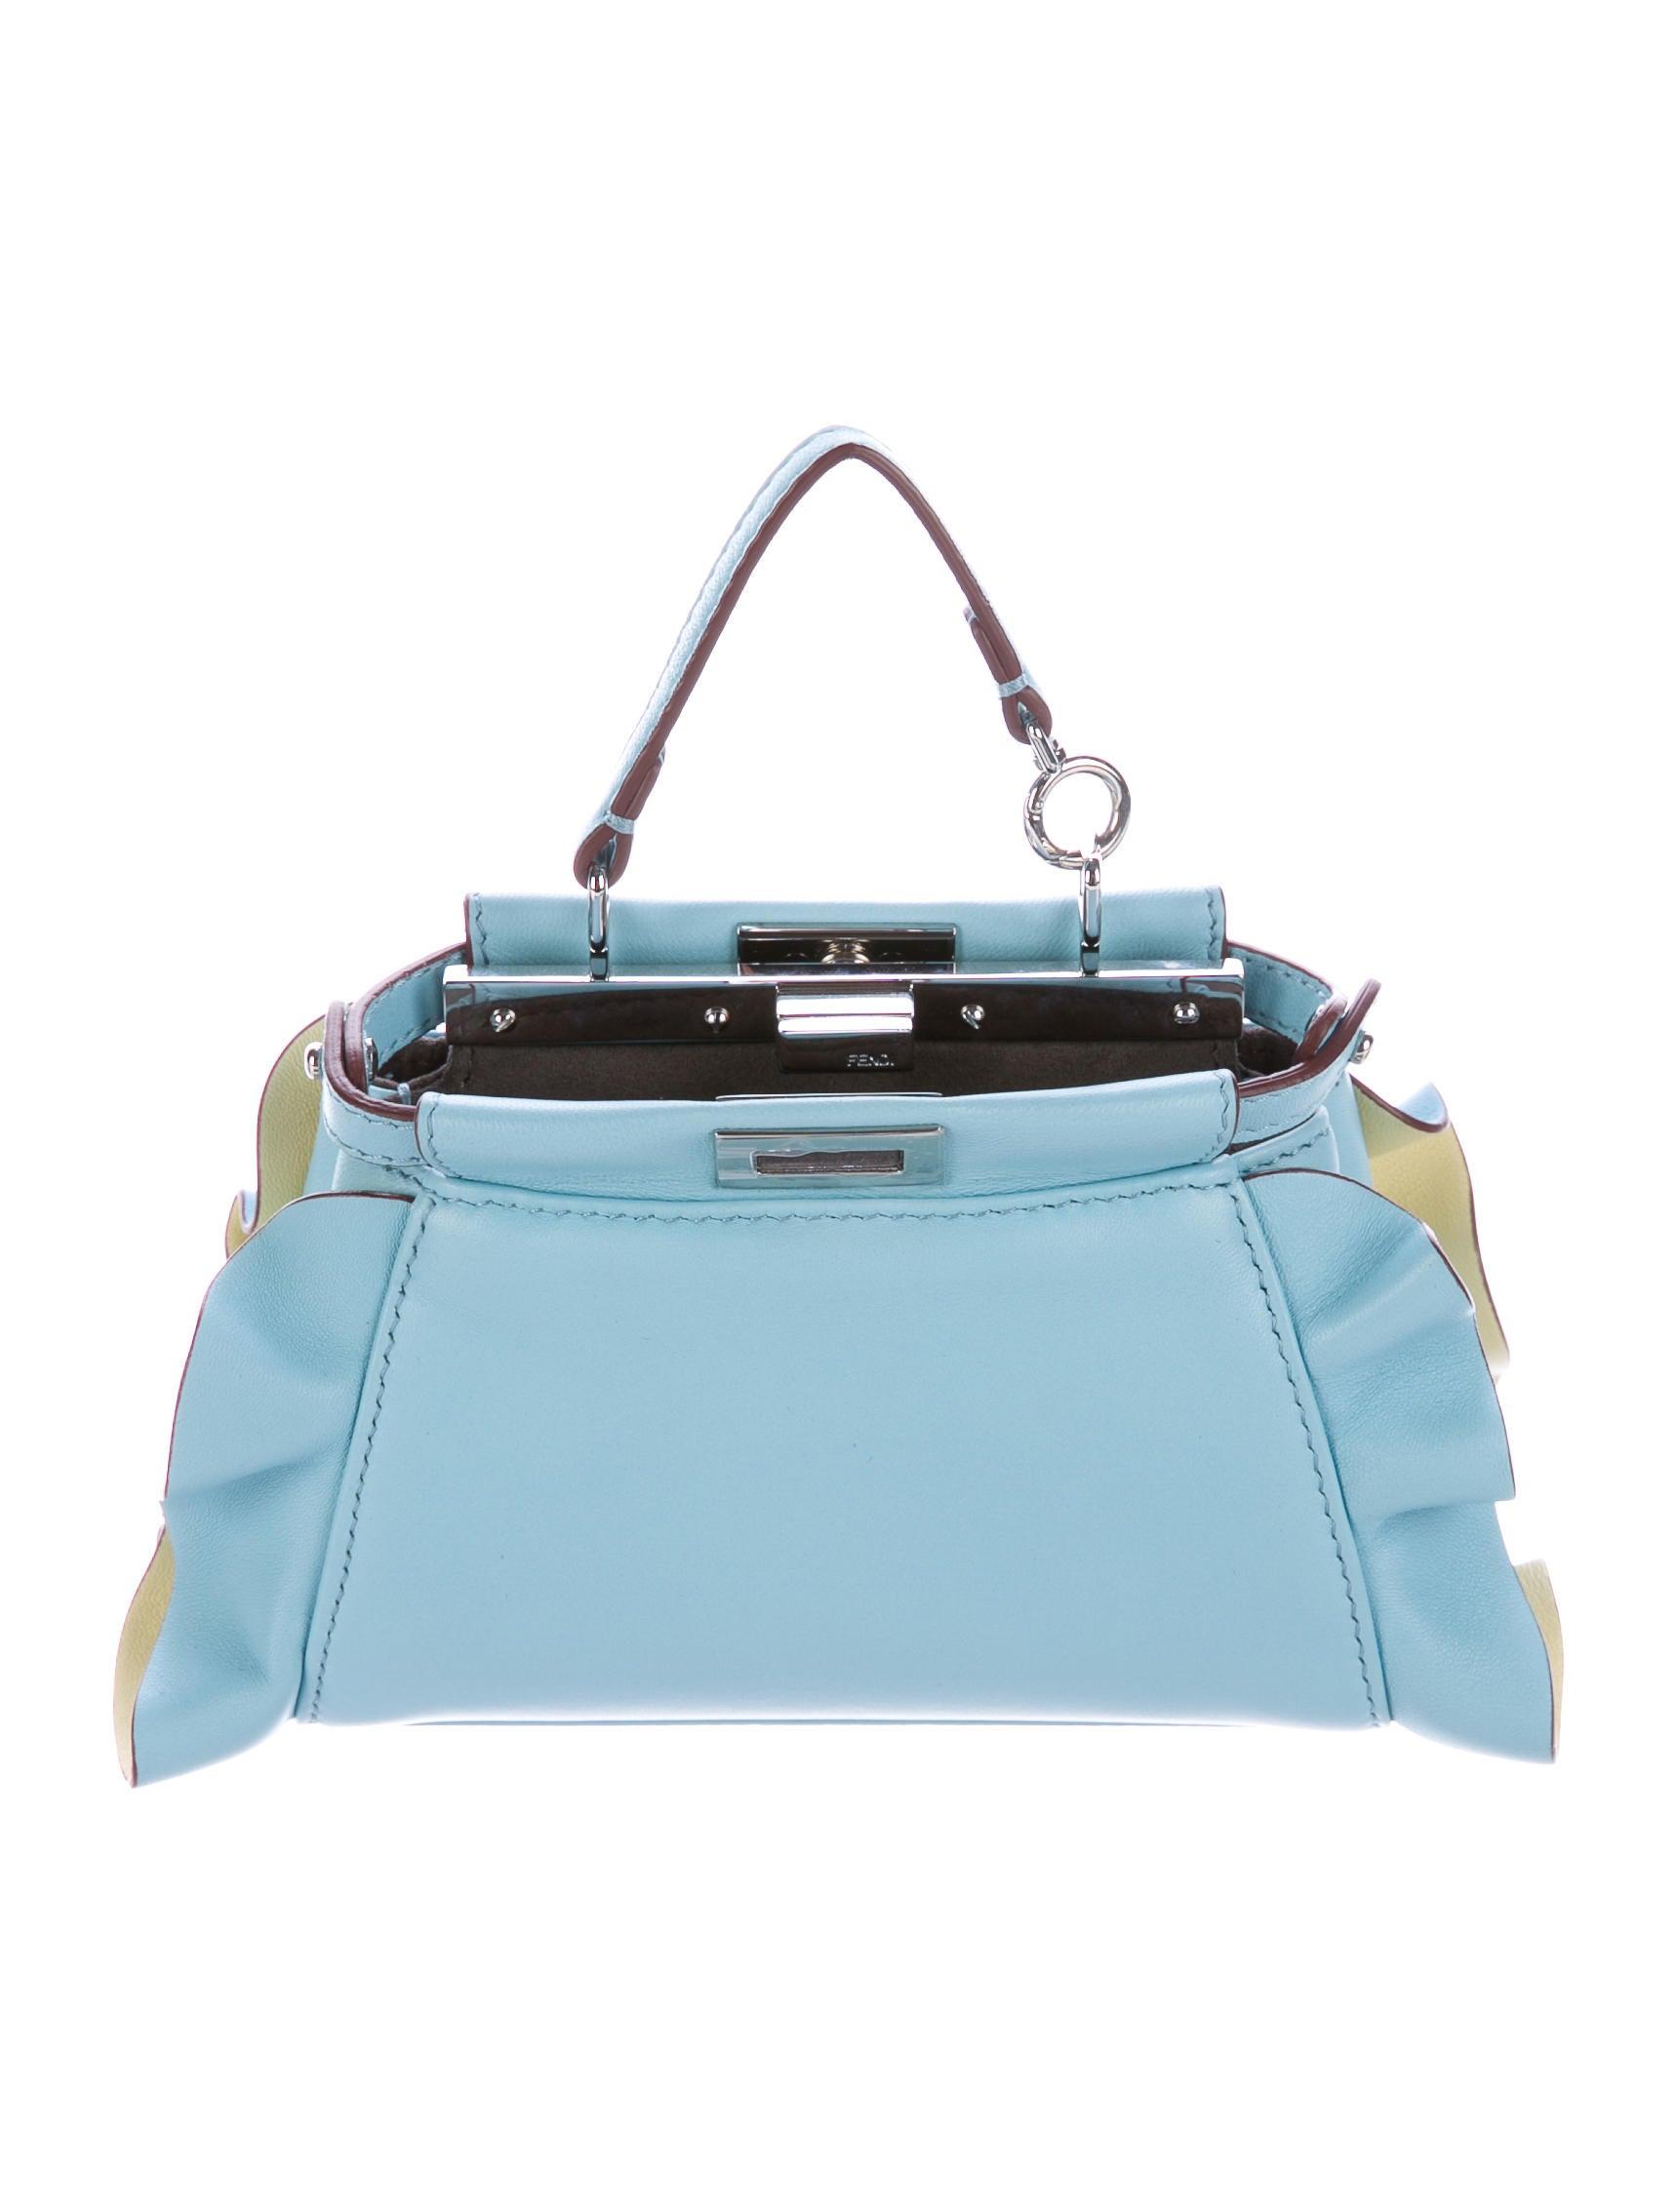 7d1c1627bfe8 Fendi Micro Peekaboo Wave Bag - Handbags - FEN60003